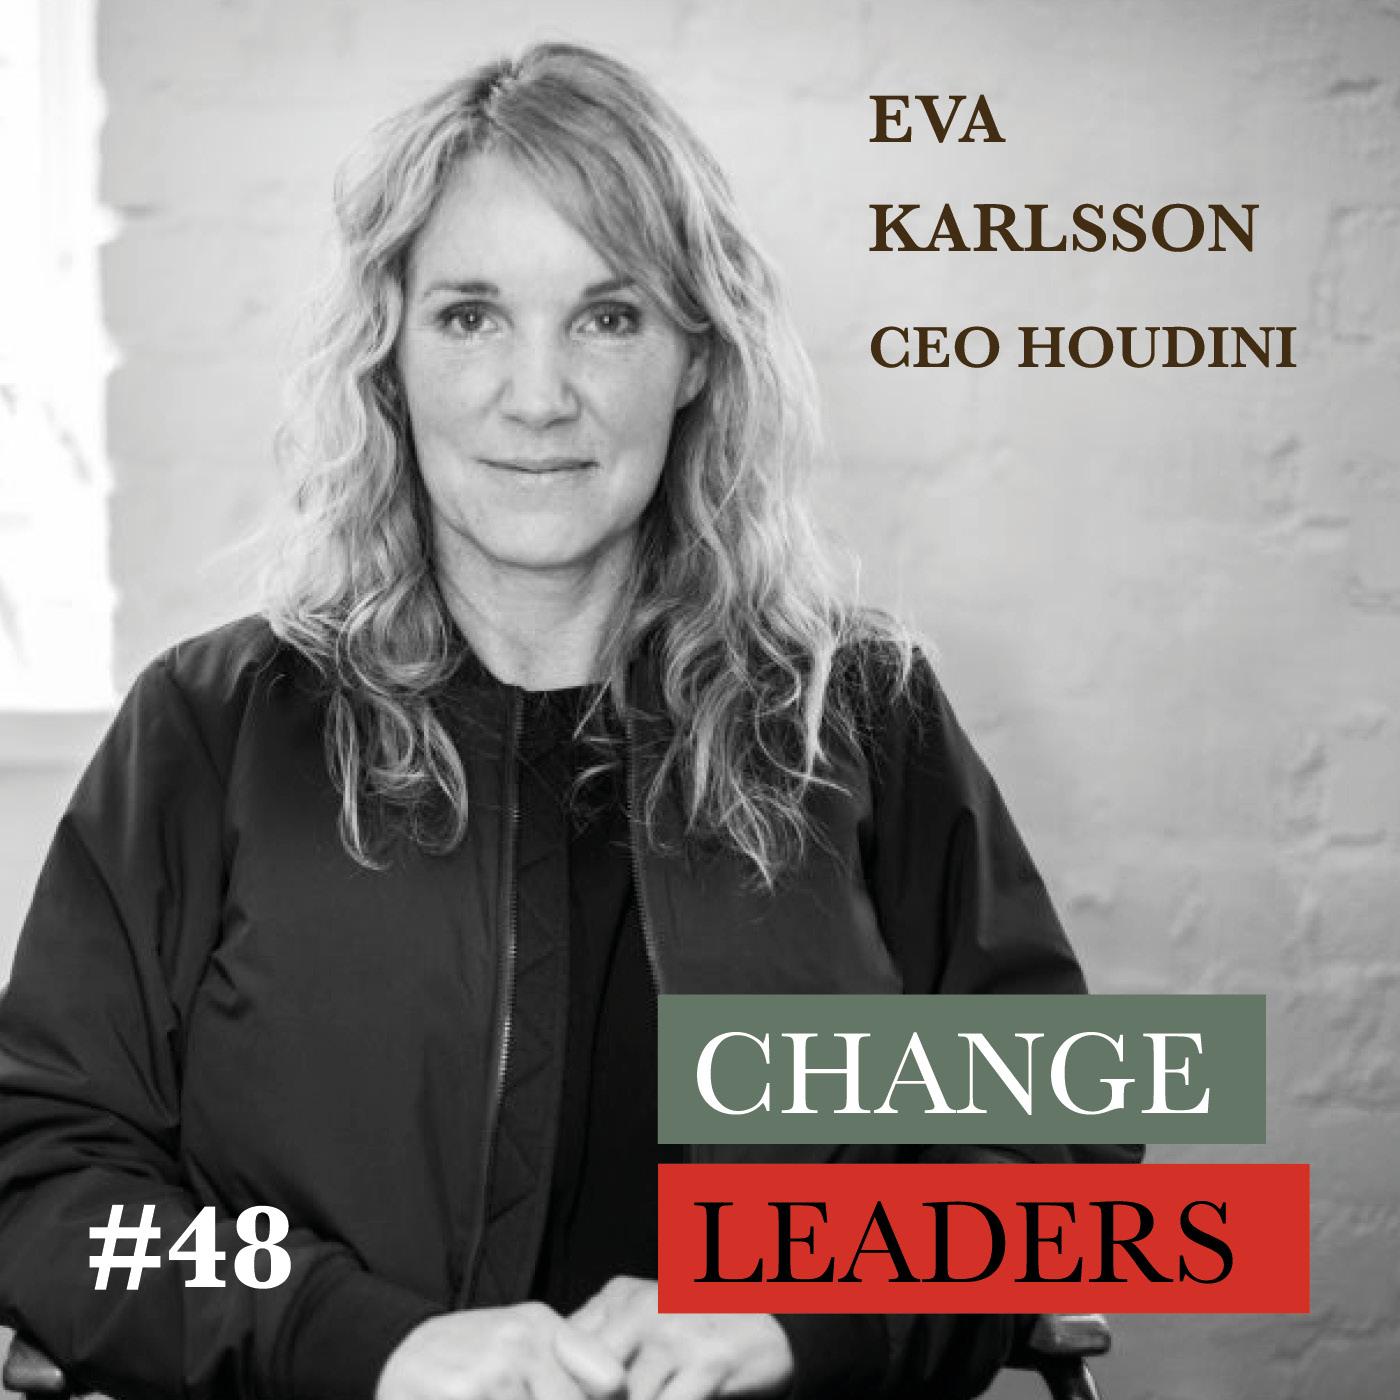 #48 Eva Karsson, CEO Houdini - What is a regenerative business model?